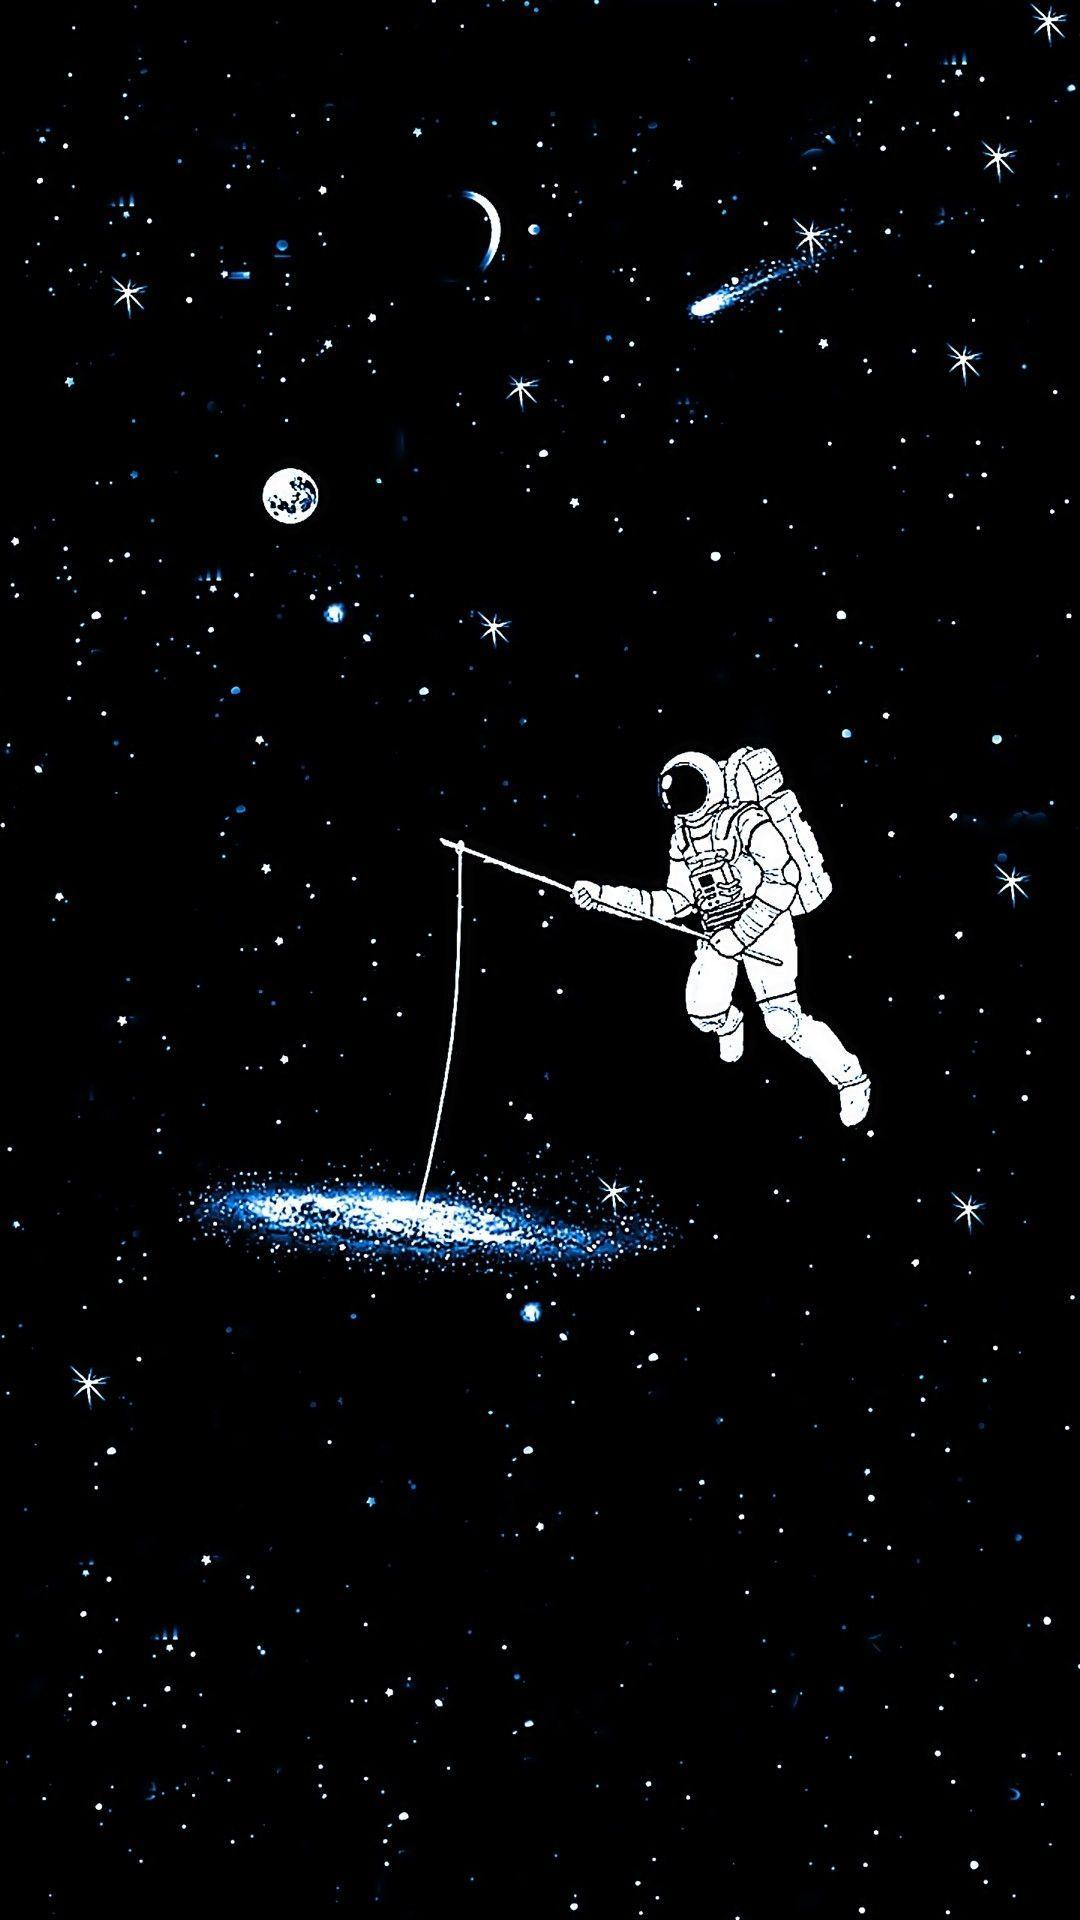 Cartoon Astronaut Wallpapers - Top Free Cartoon Astronaut ...